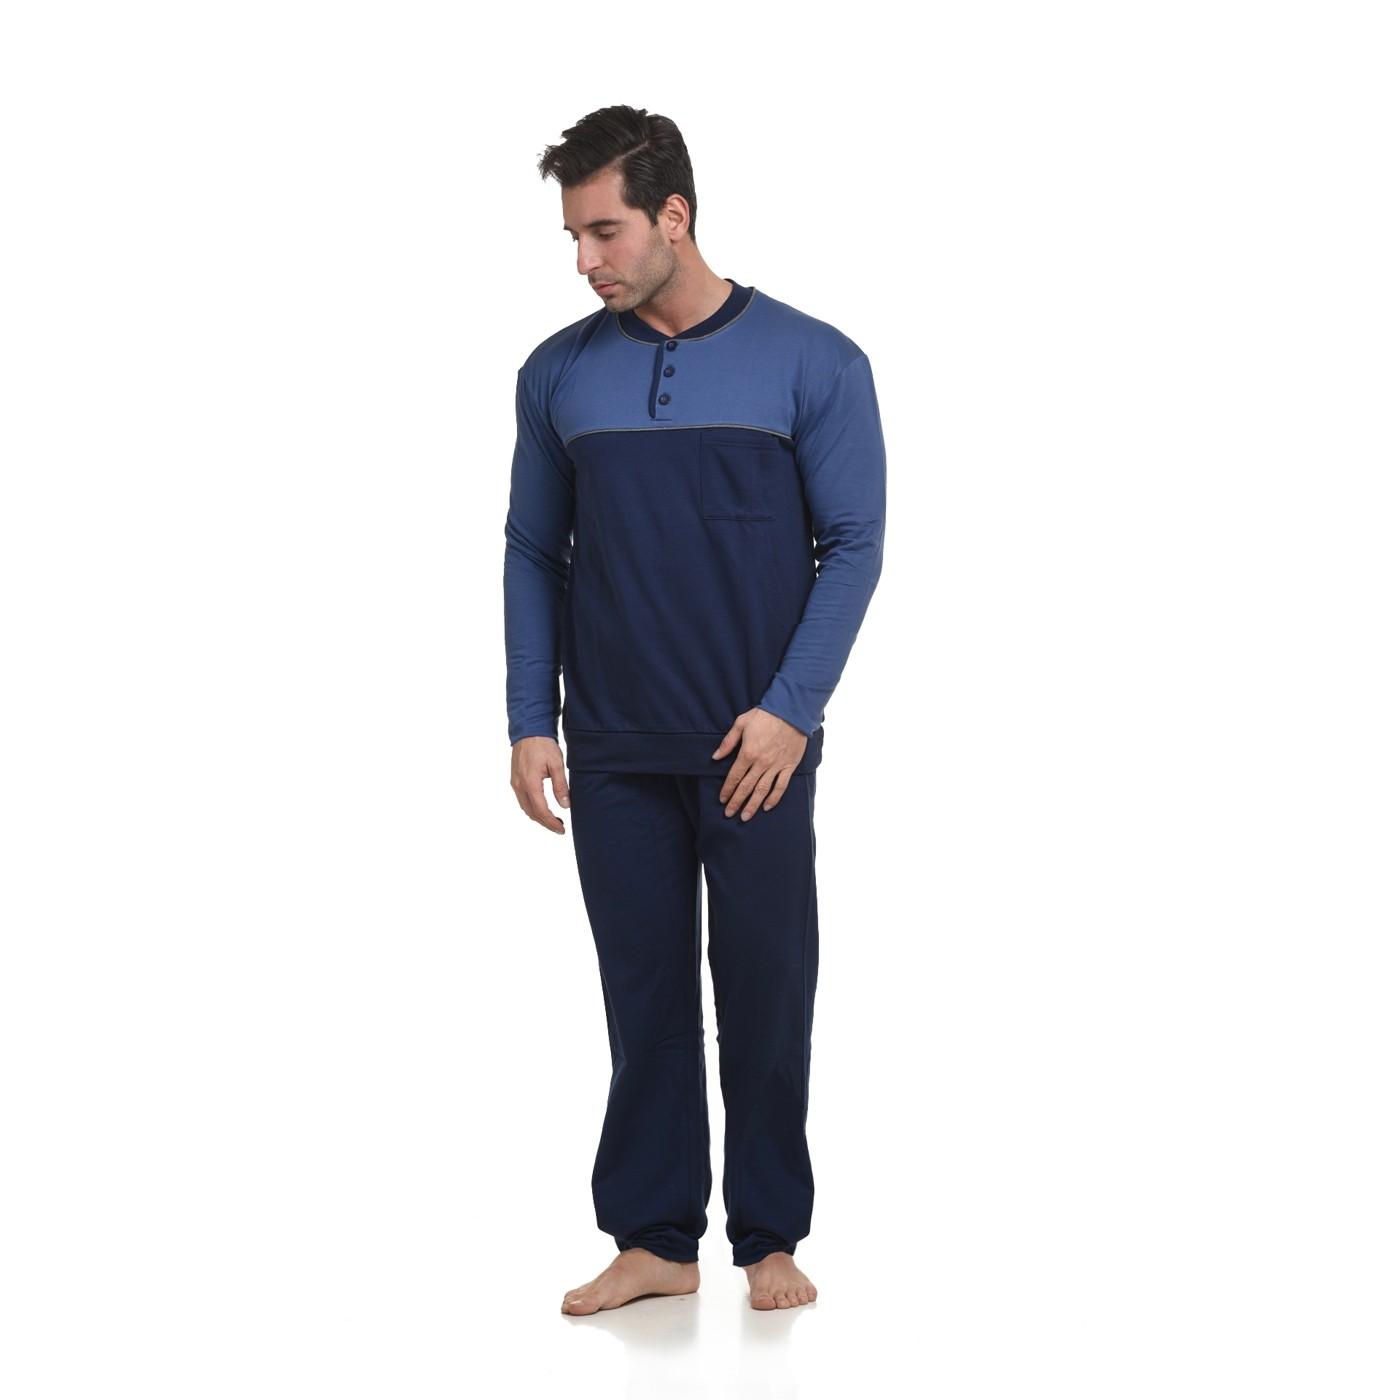 7f4d6e28d1f Ανδρική Πυτζάμα βαμβακερή φούτερ Max Μέγεθος με τσέπη -ΠΛΦ0106